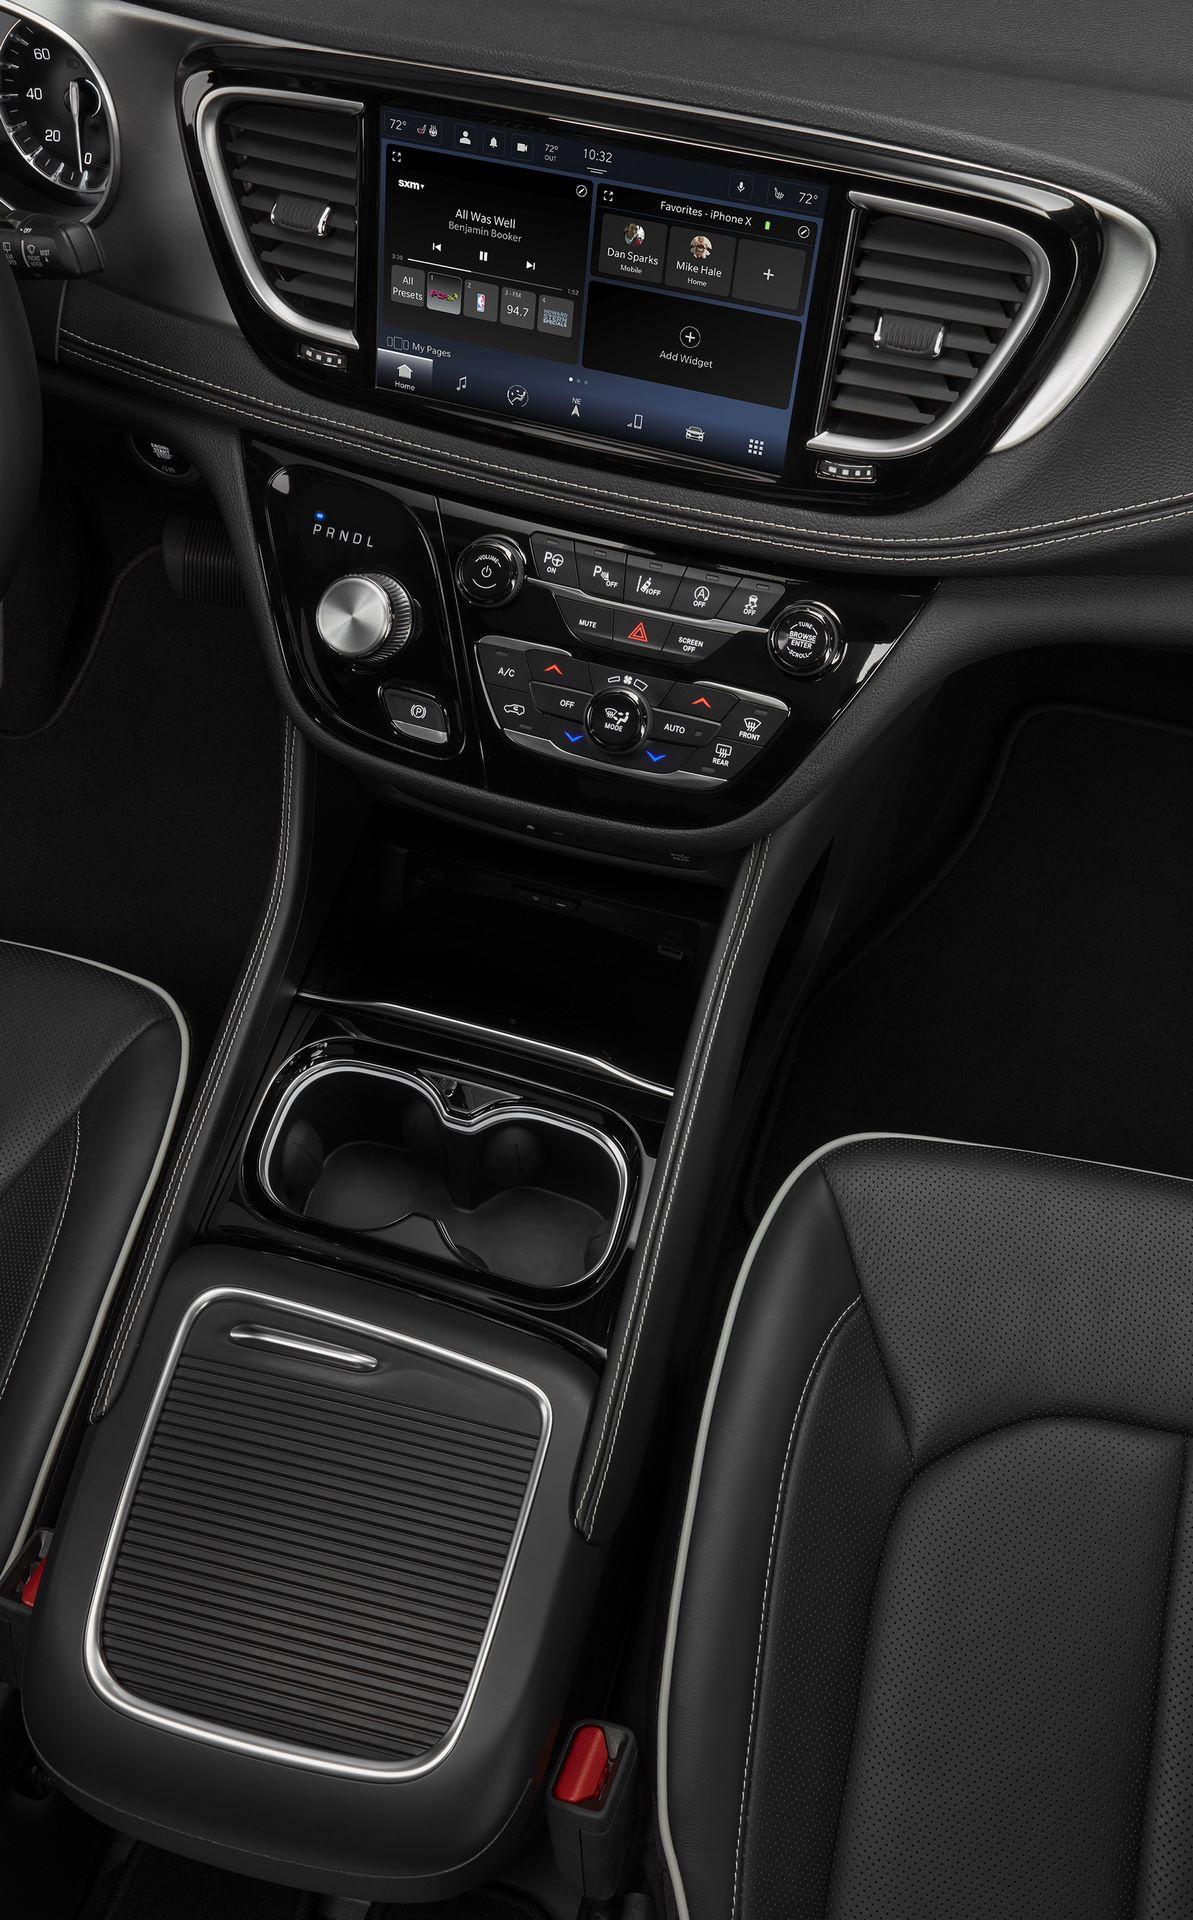 2021-Chrysler-Pacifica-141